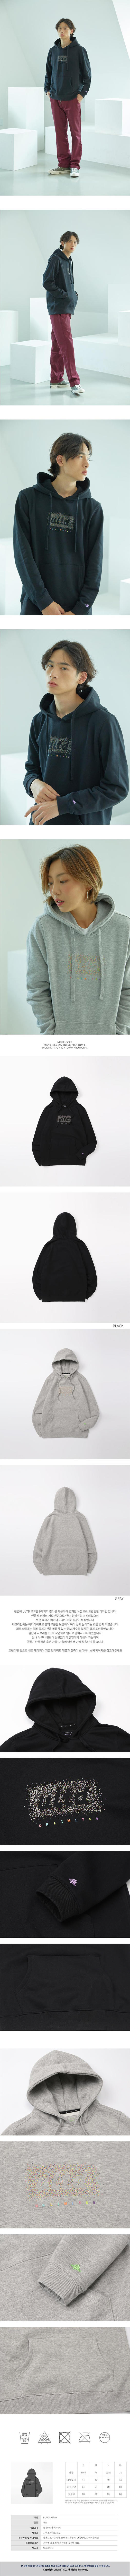 Palette Hood (U19DTHD39) - 언리미트, 72,000원, 스트릿패션, 후드티/집업